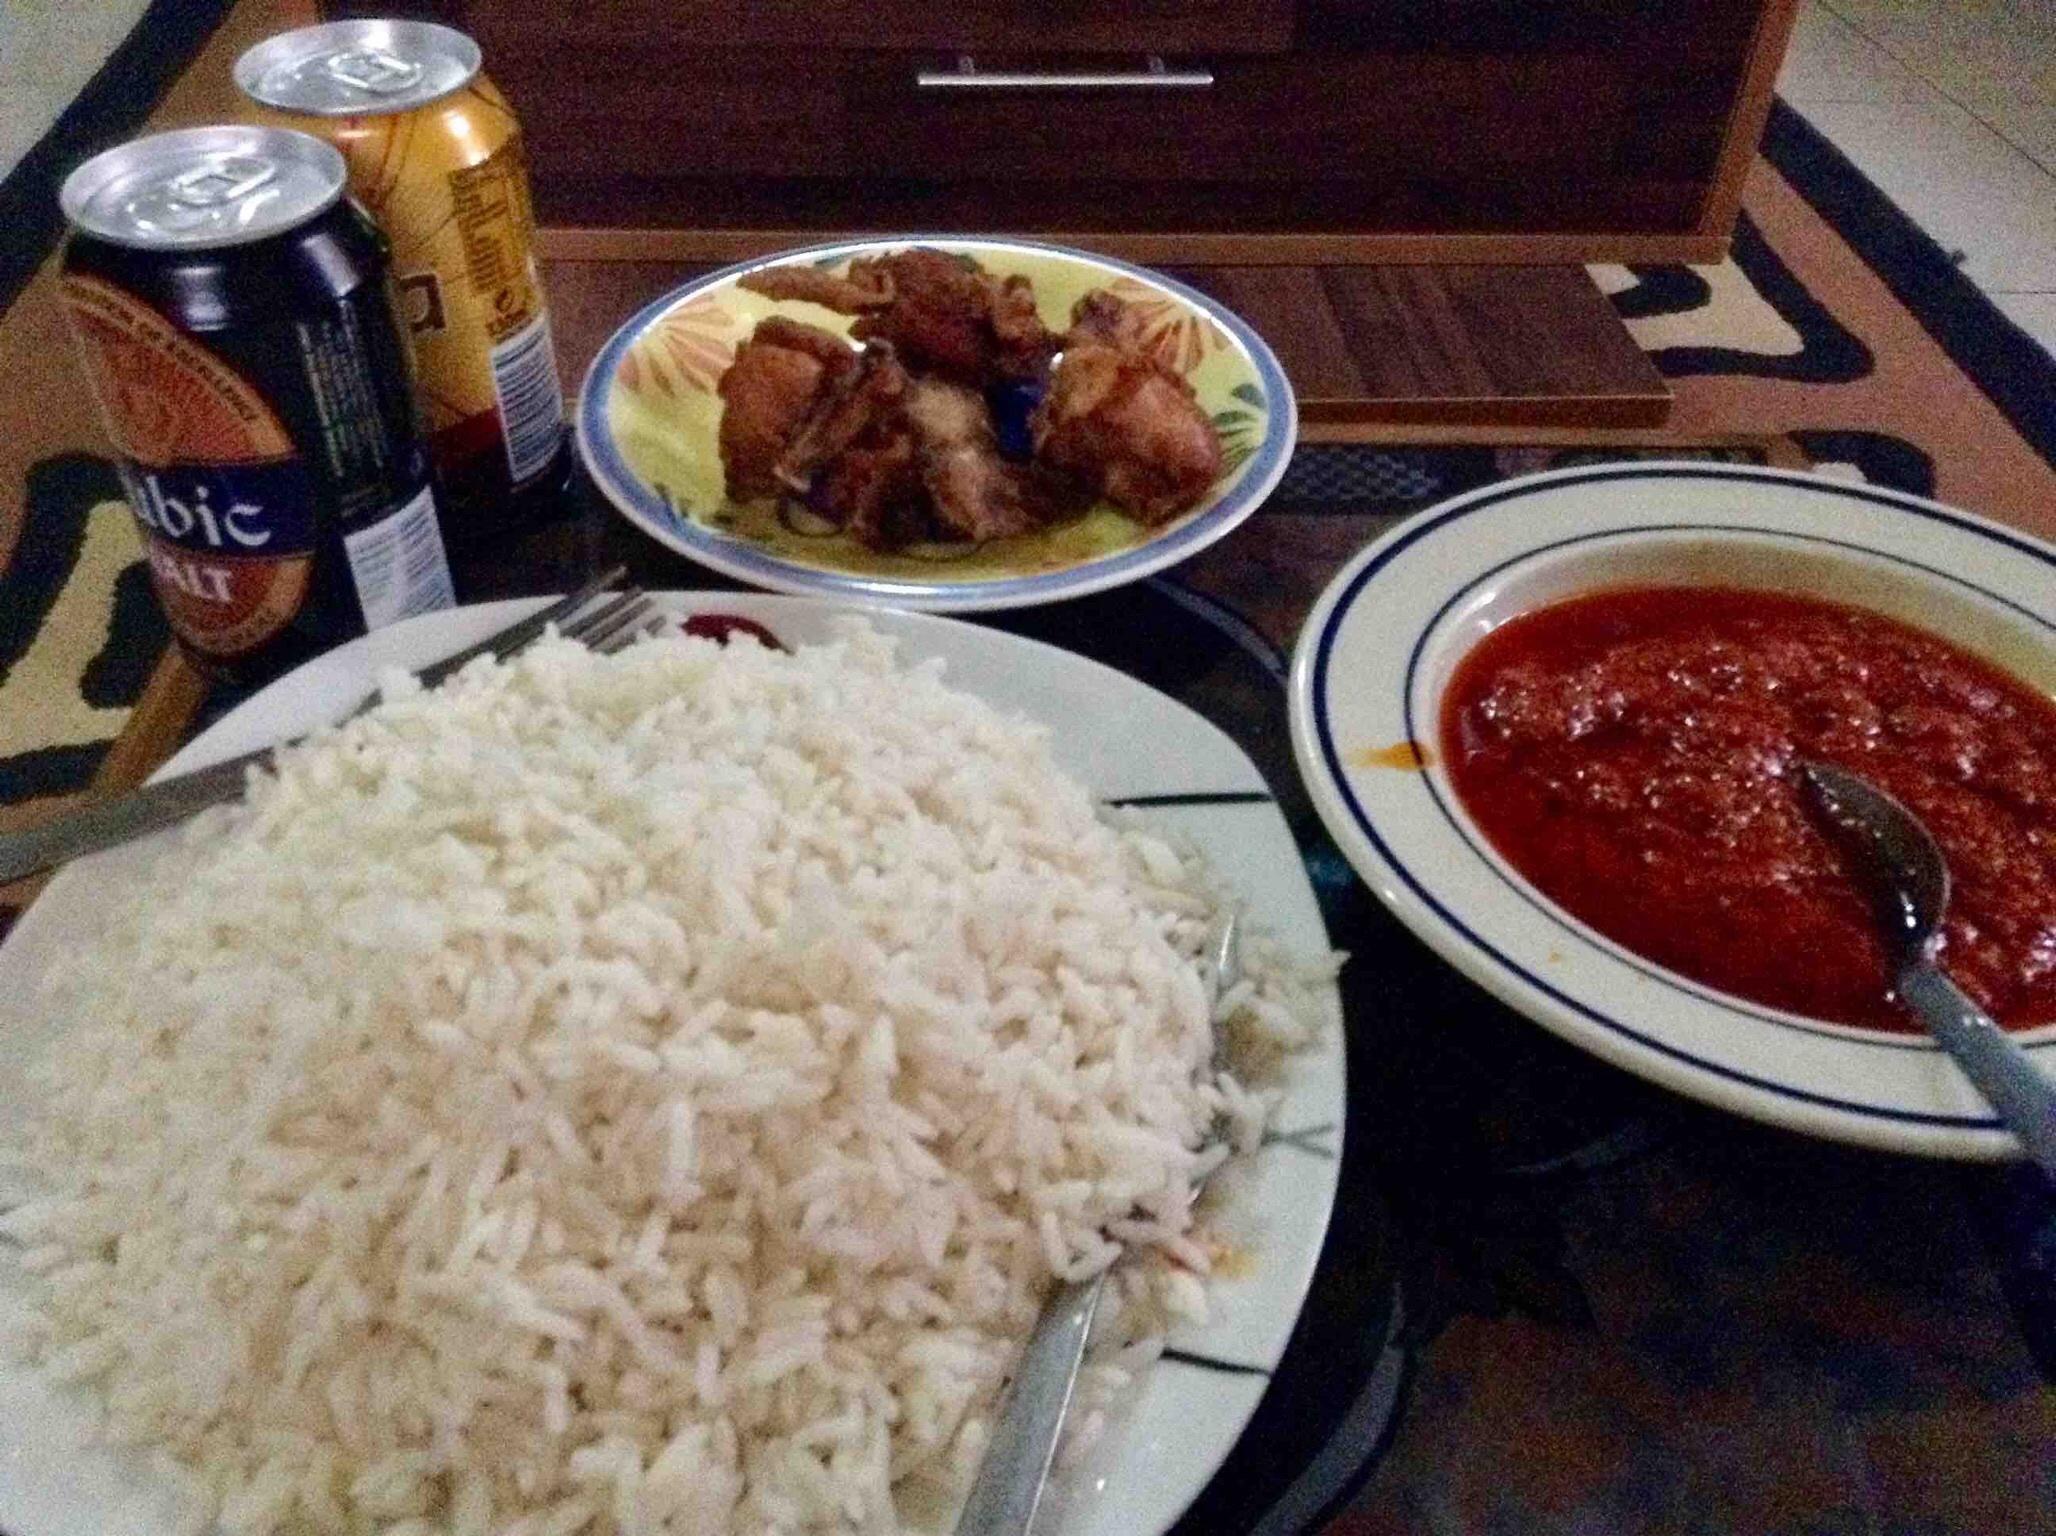 Rice and stew very plenty!